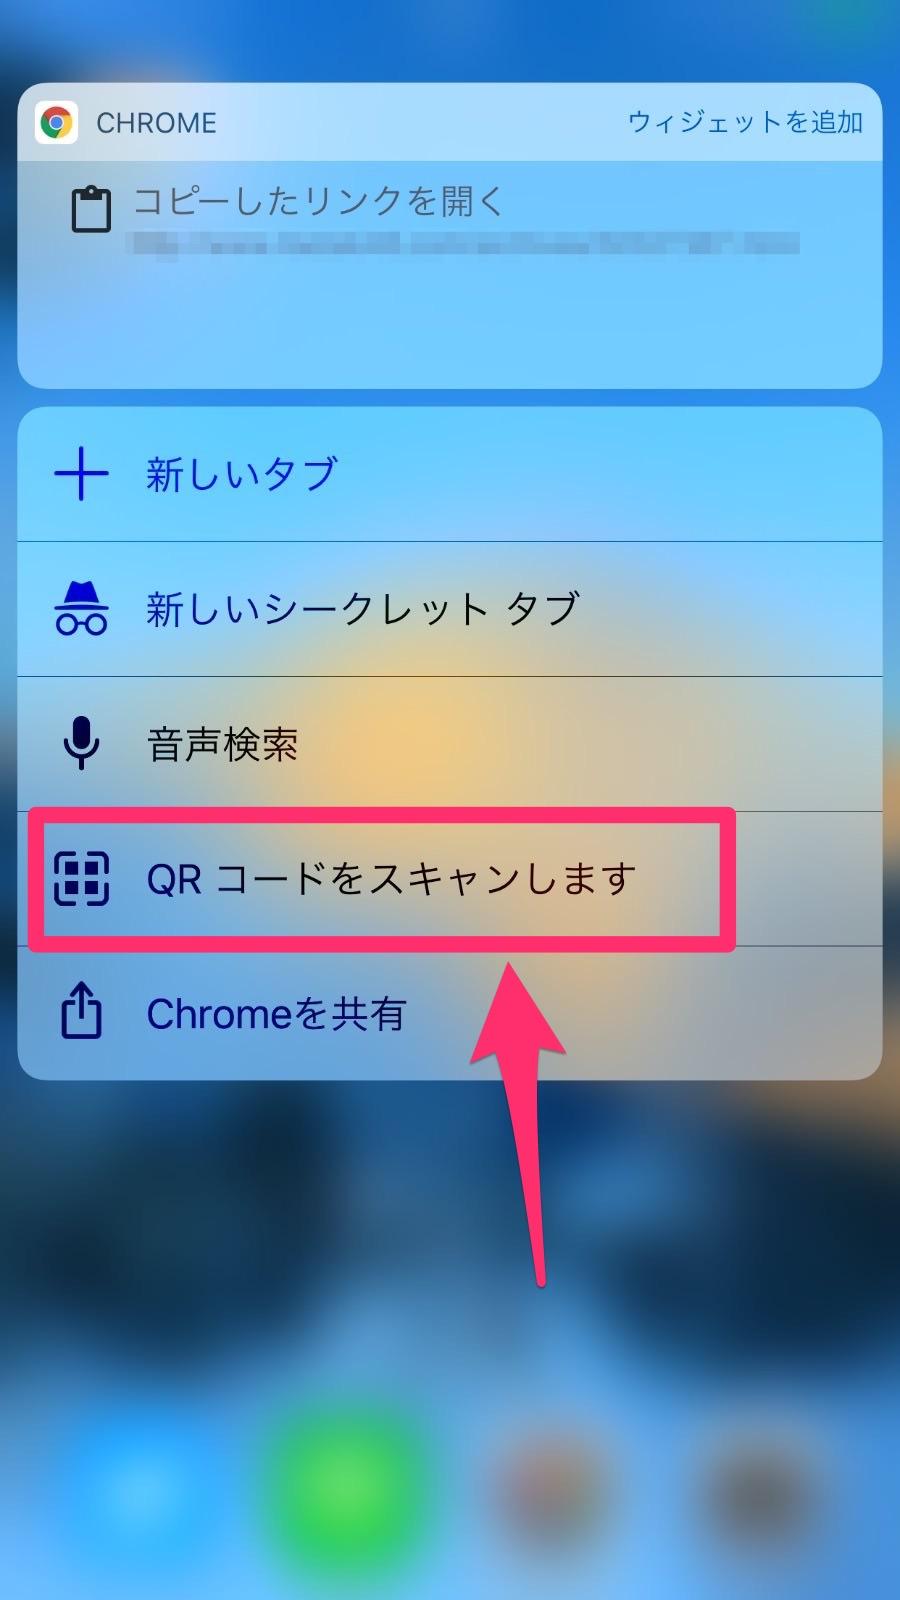 Google chrome qr code 4984